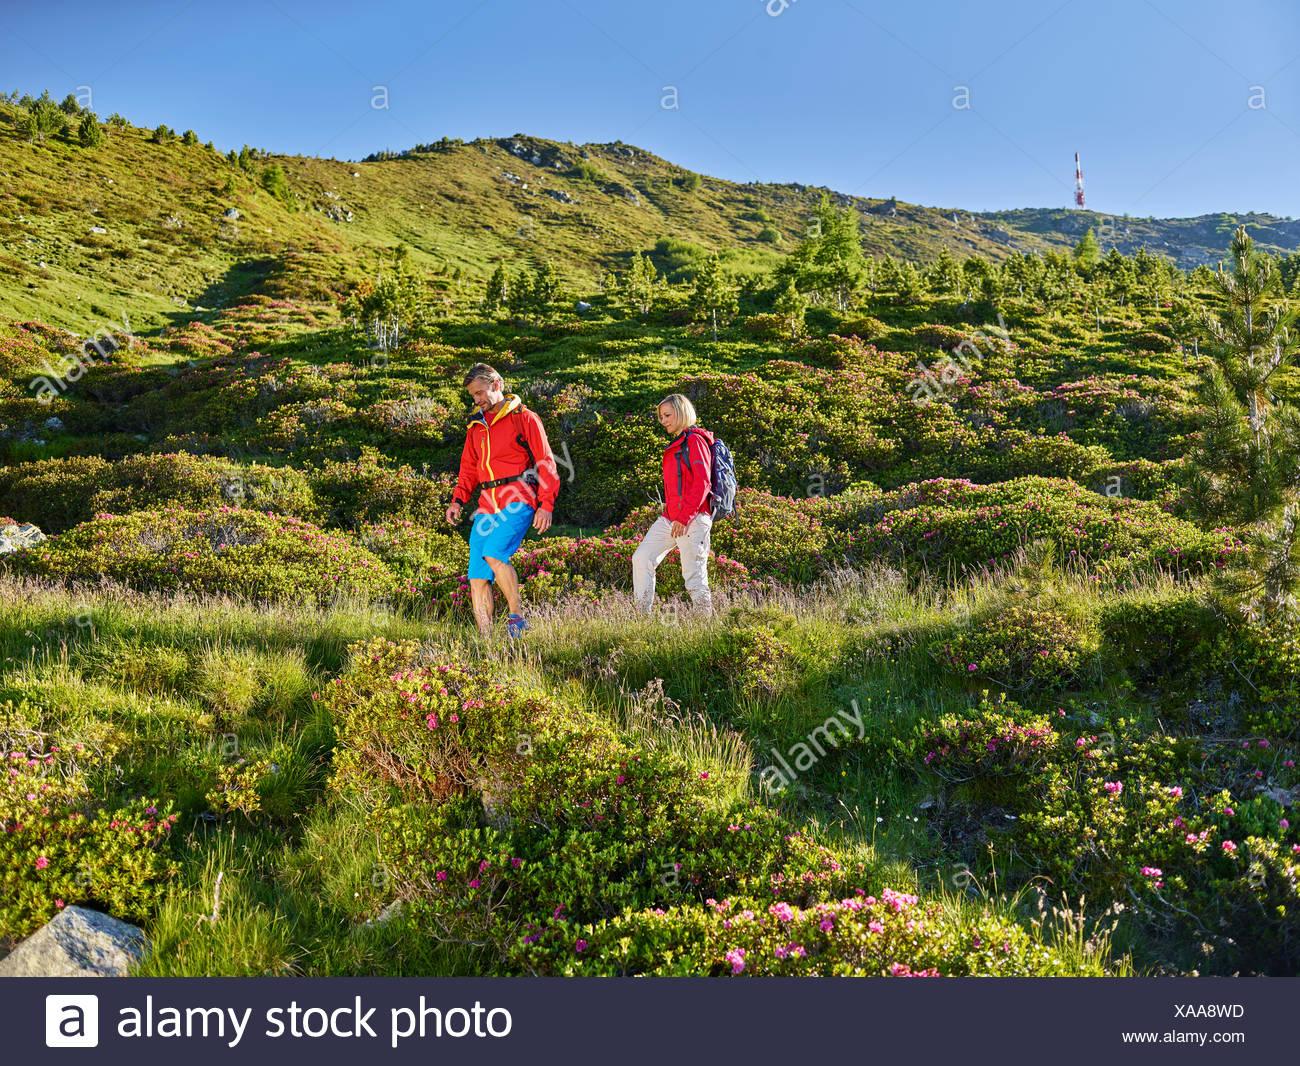 Woman 35-40 years and man 40-45 years hiking, Zirbenweg, Patscherkofel, Innsbruck, Tyrol, Austria - Stock Image